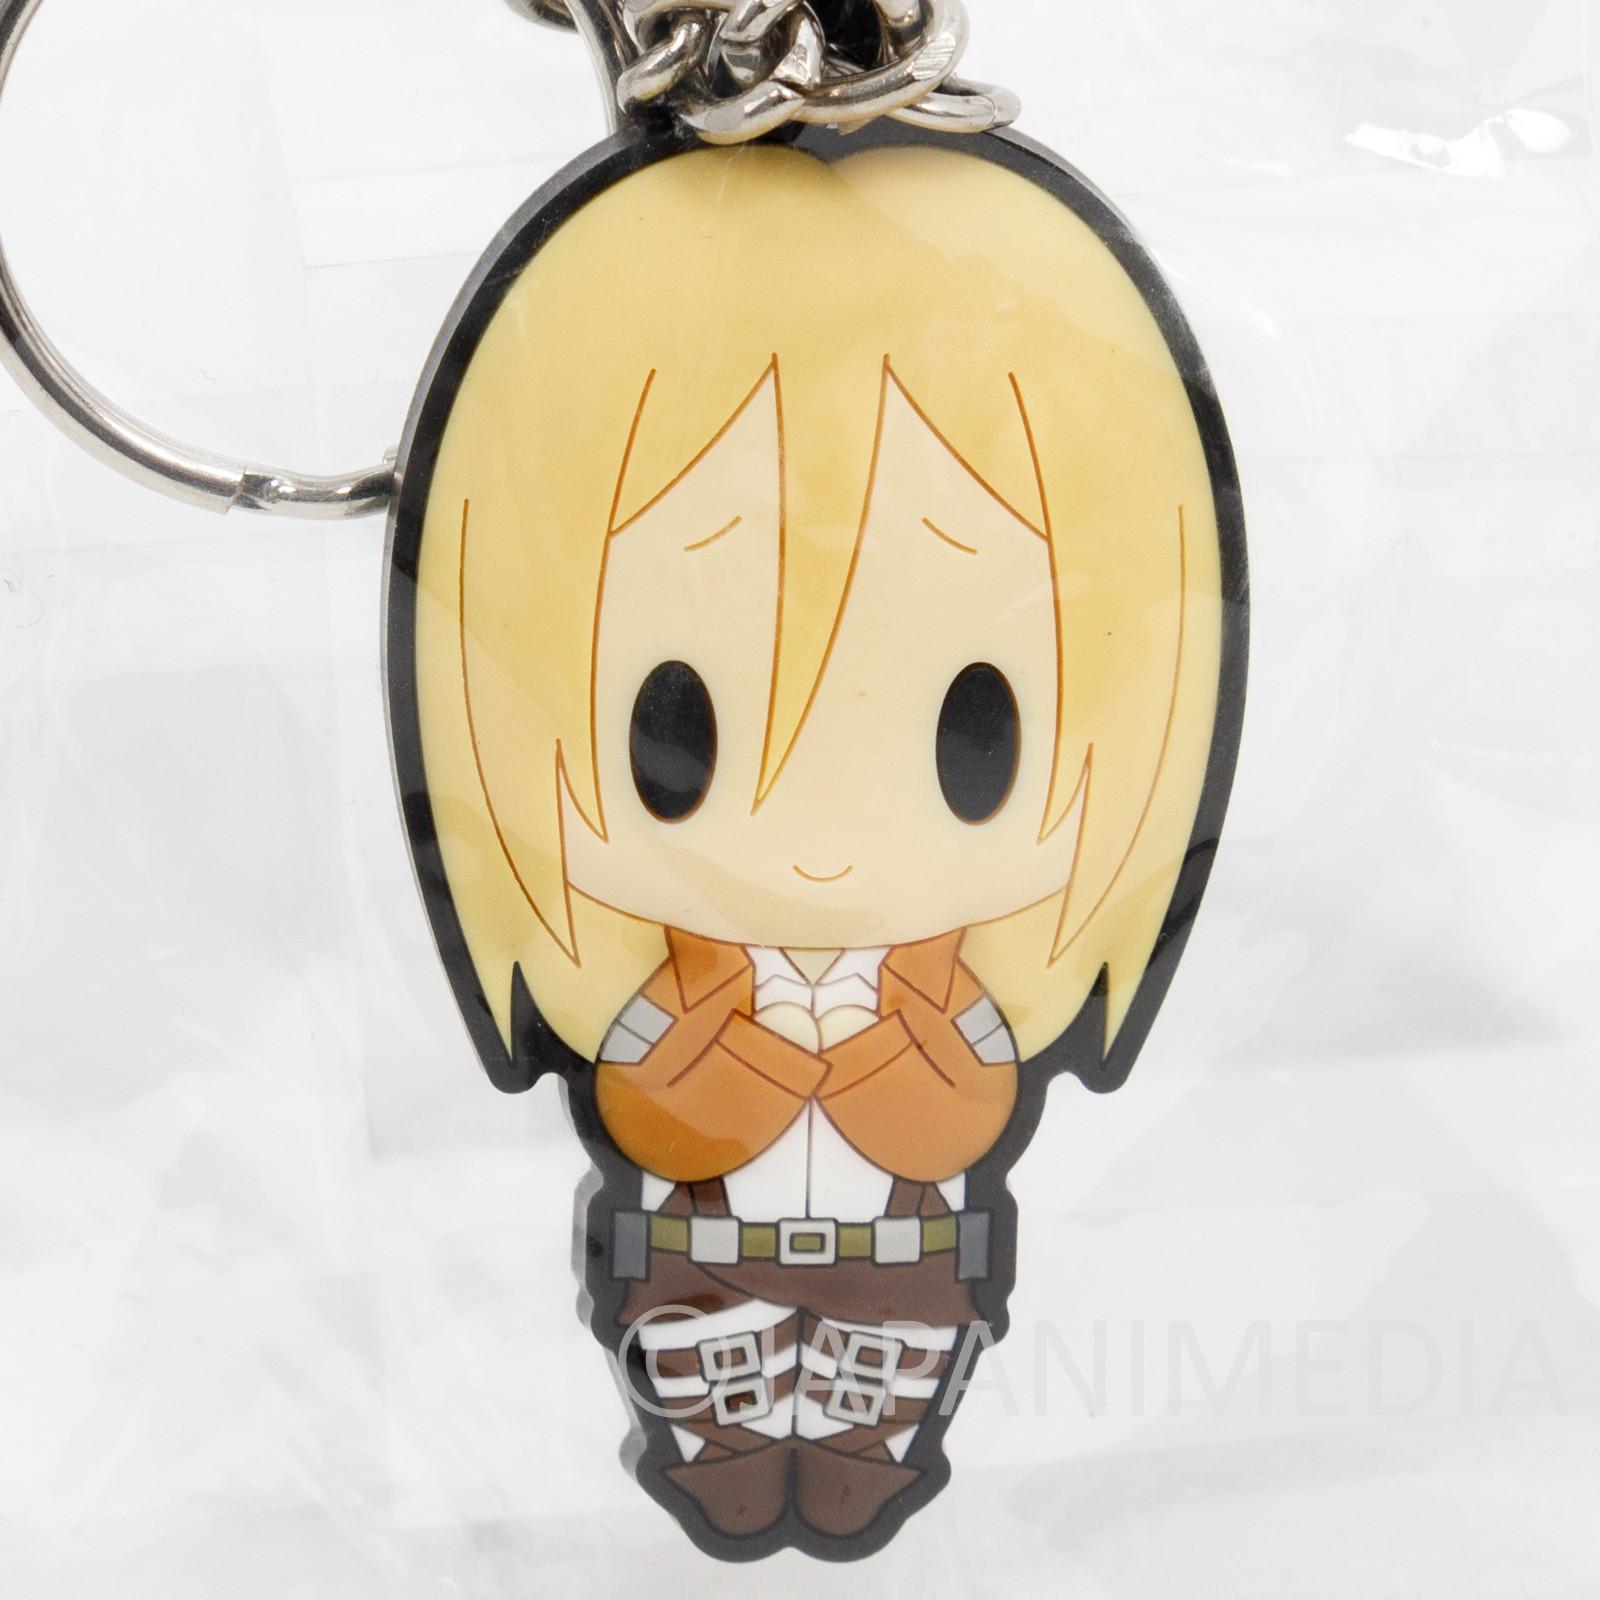 Attack on Titan Krista Lenz Rubber Mascot Keychain JAPAN ANIME